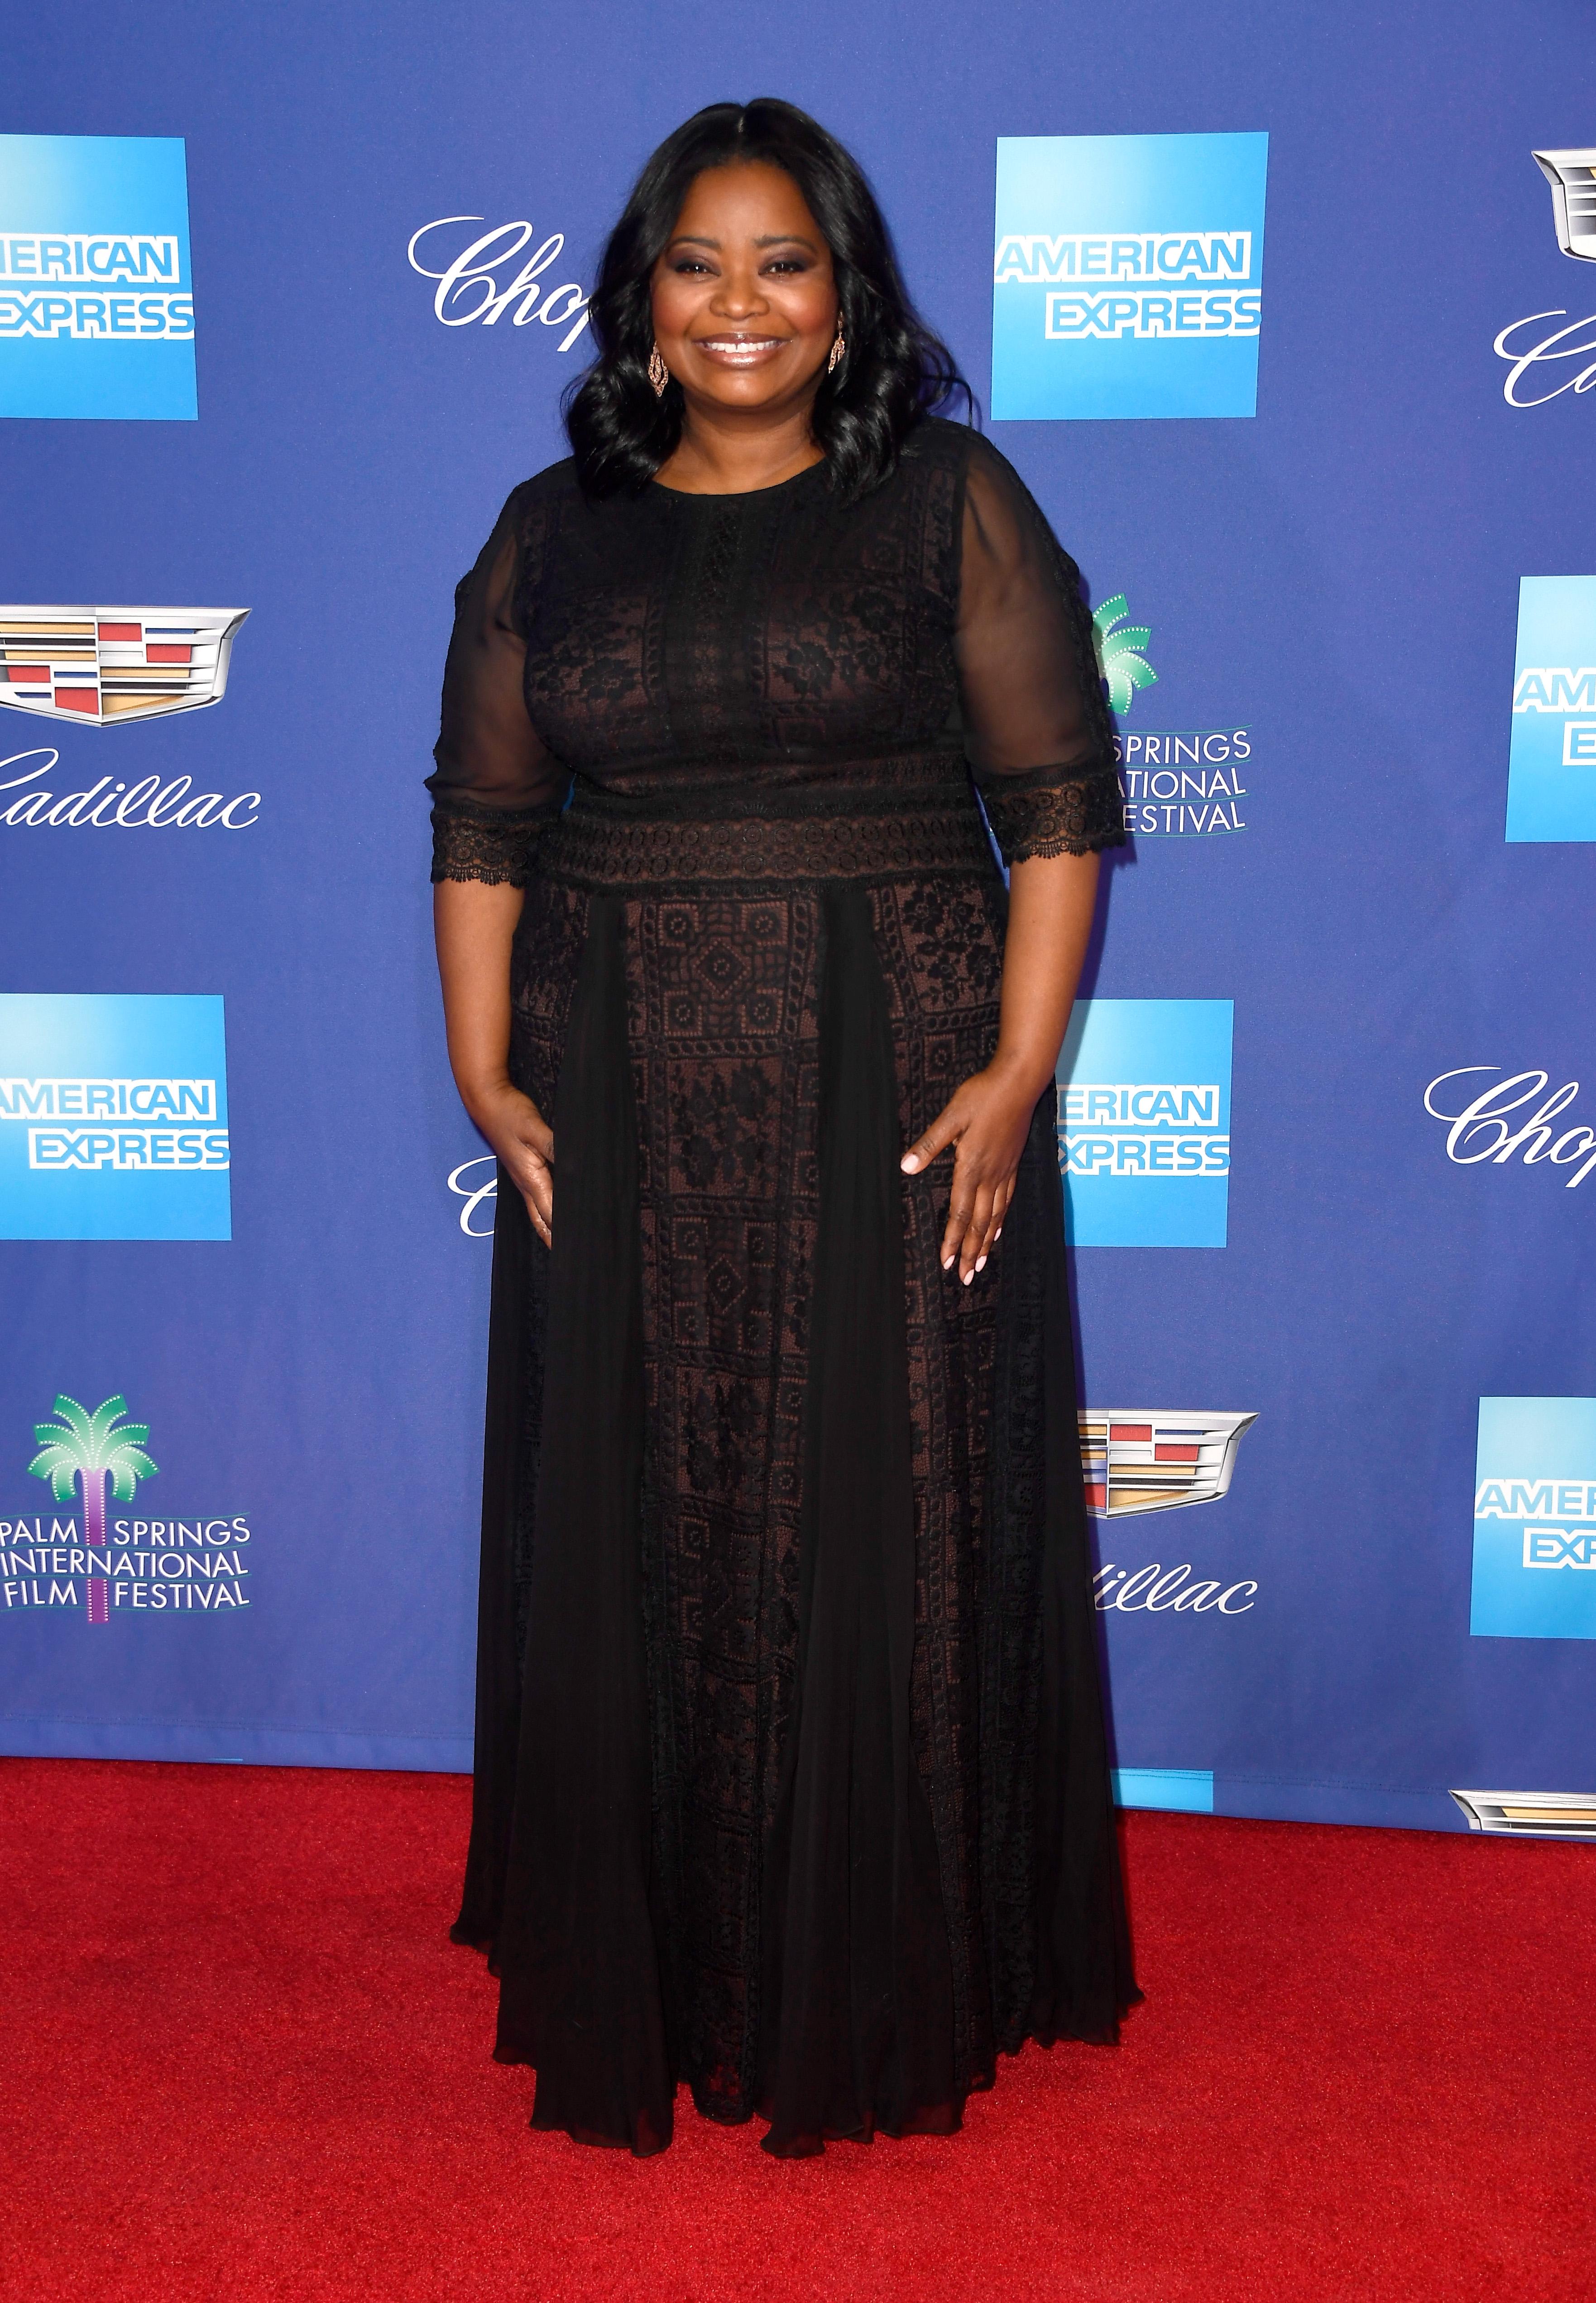 29th Annual Palm Springs International Film Festival Awards Gala - Arrivals